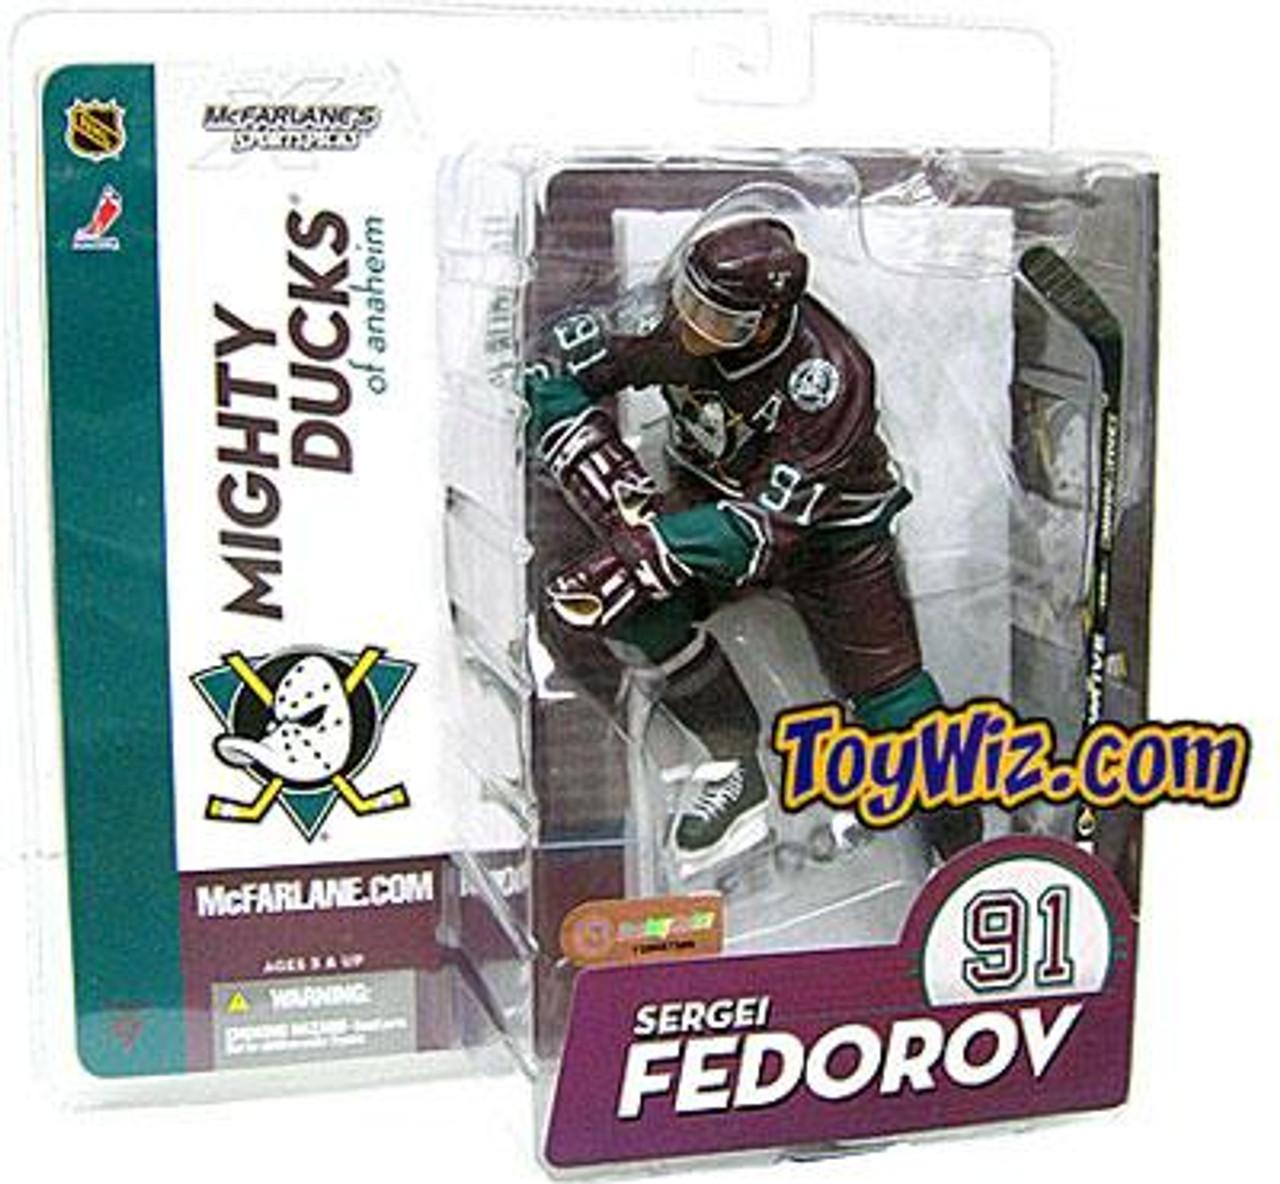 McFarlane Toys NHL Anaheim Mighty Ducks Sports Picks Series 9 Sergei Fedorov Action Figure [Purple Jersey]